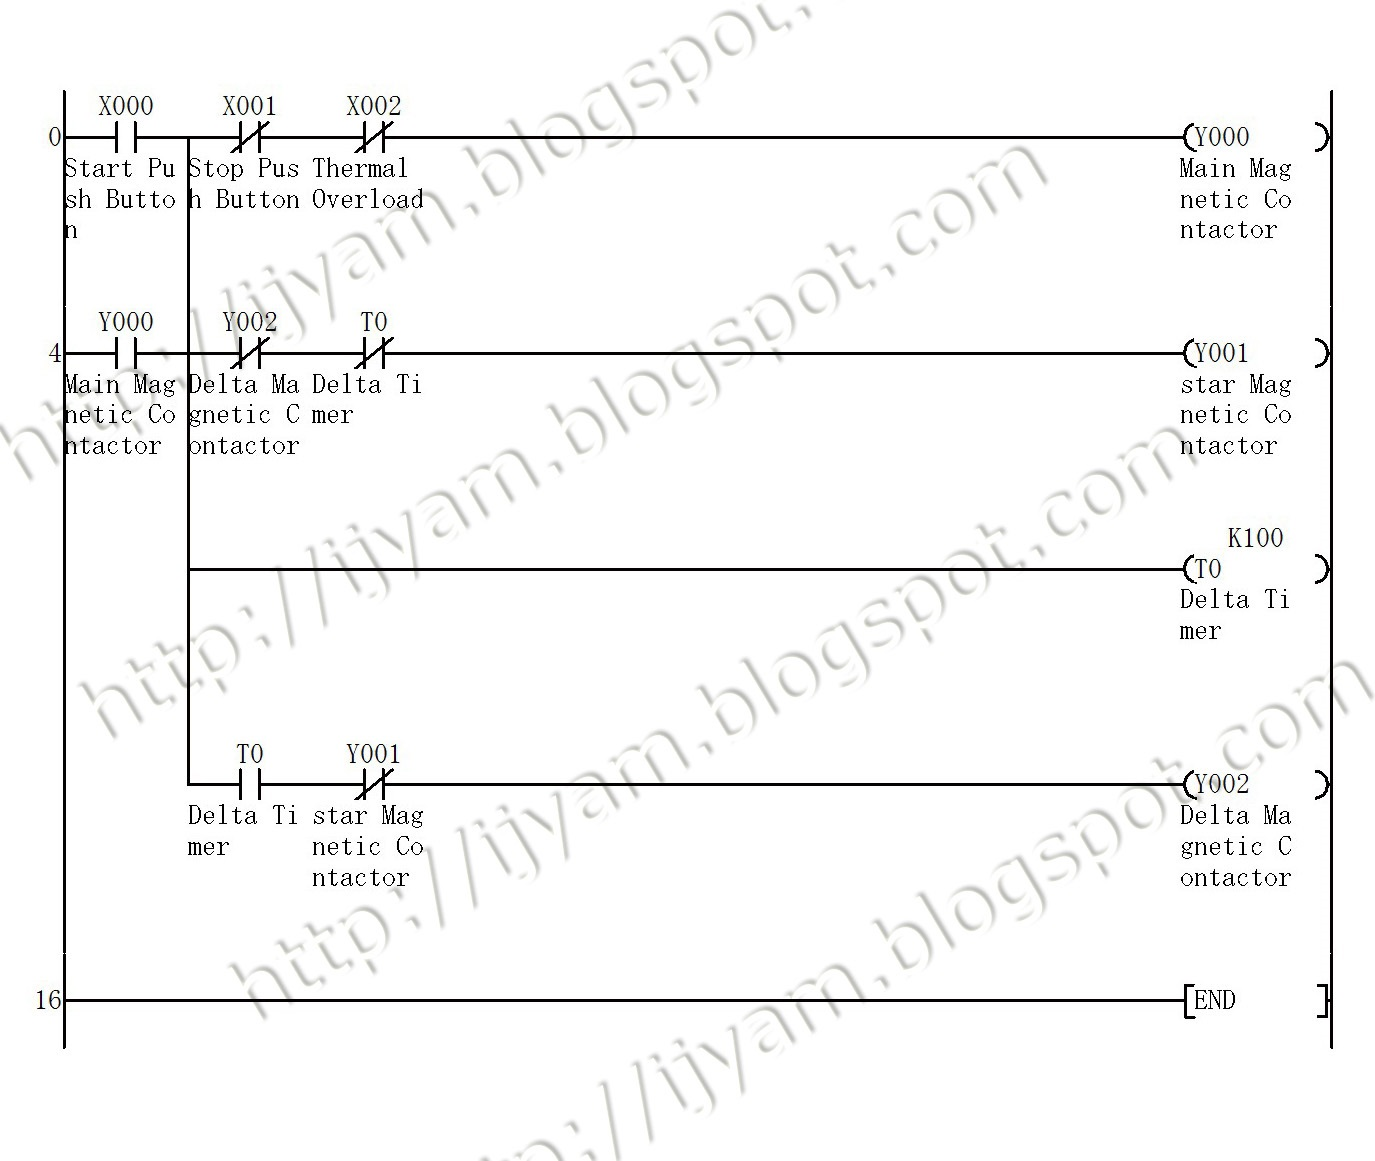 Wiring Diagram Plc Mitsubishi Underfloor Heating Ge Diagrams